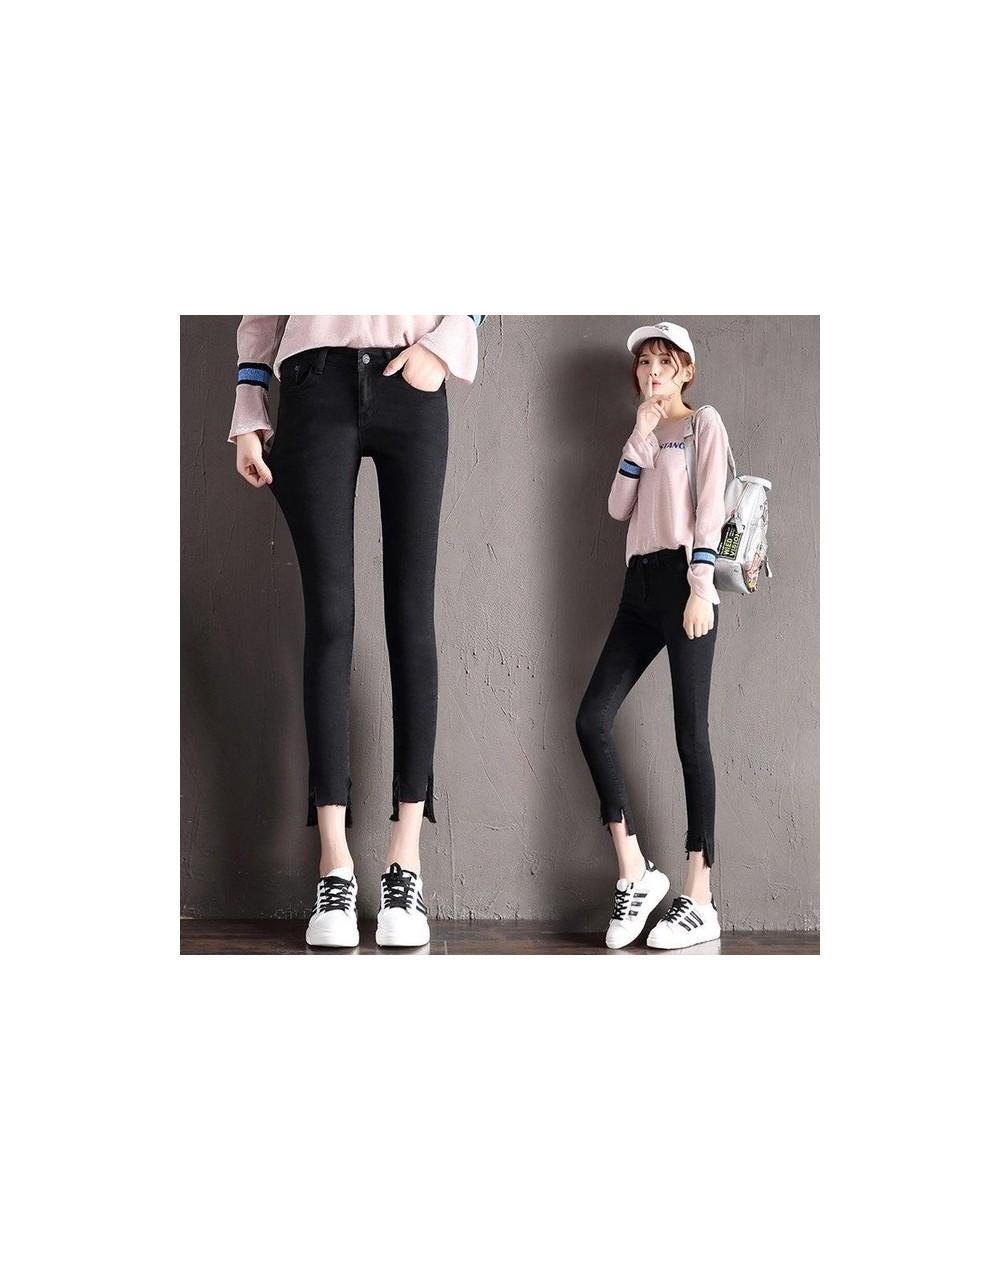 Female Figure-hugging Jeans Irregular Trousers Feet Elastic Pencil Pants - black - 4N4160367286-1